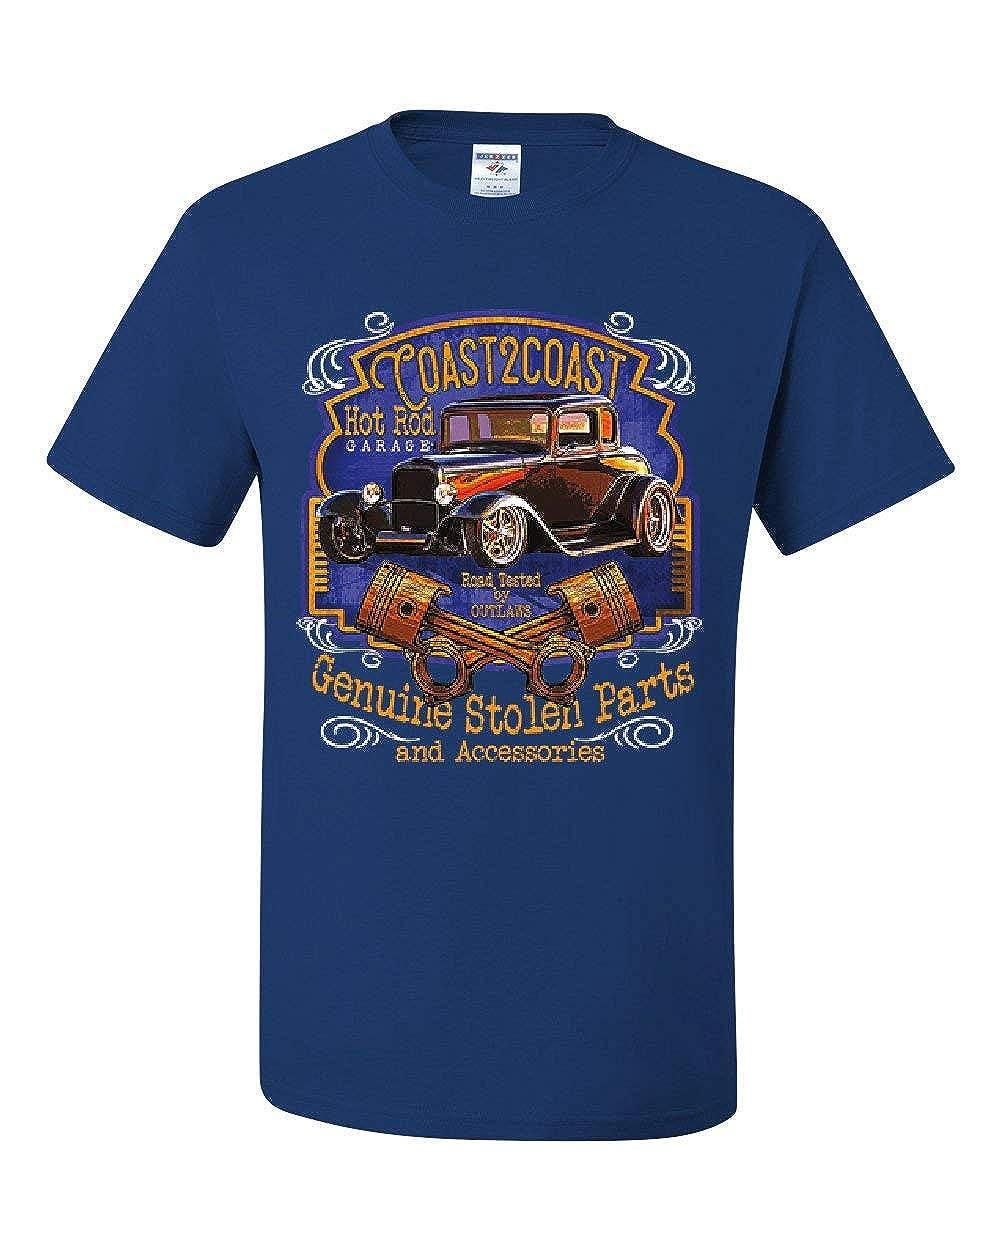 Coast 2 Coast Hot Rod Garage T-Shirt American Outlaw Route 66 Tee Shirt